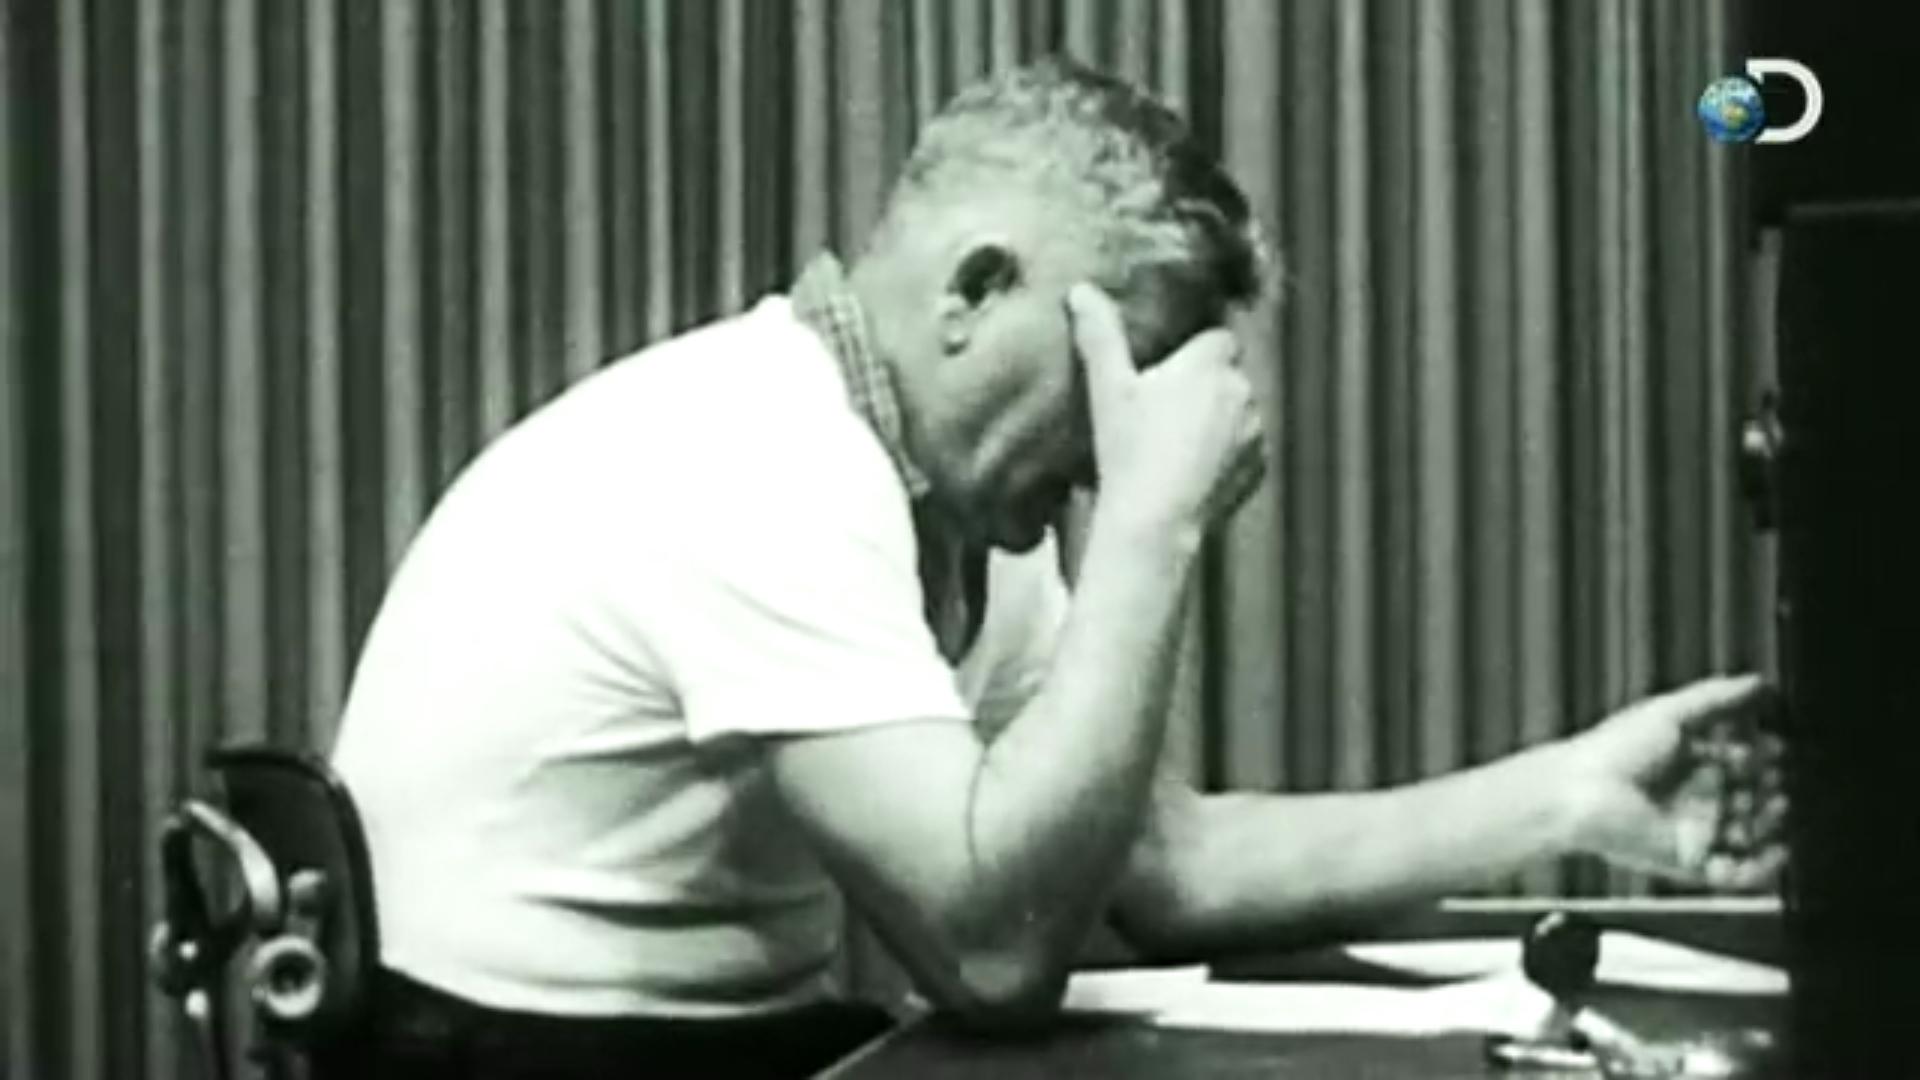 Curiosity: How Evil Are You? | The Milgram Experiment Discovery有重新製作實驗的片段,可以從這三分鐘體驗按下開關的手有多沉重。